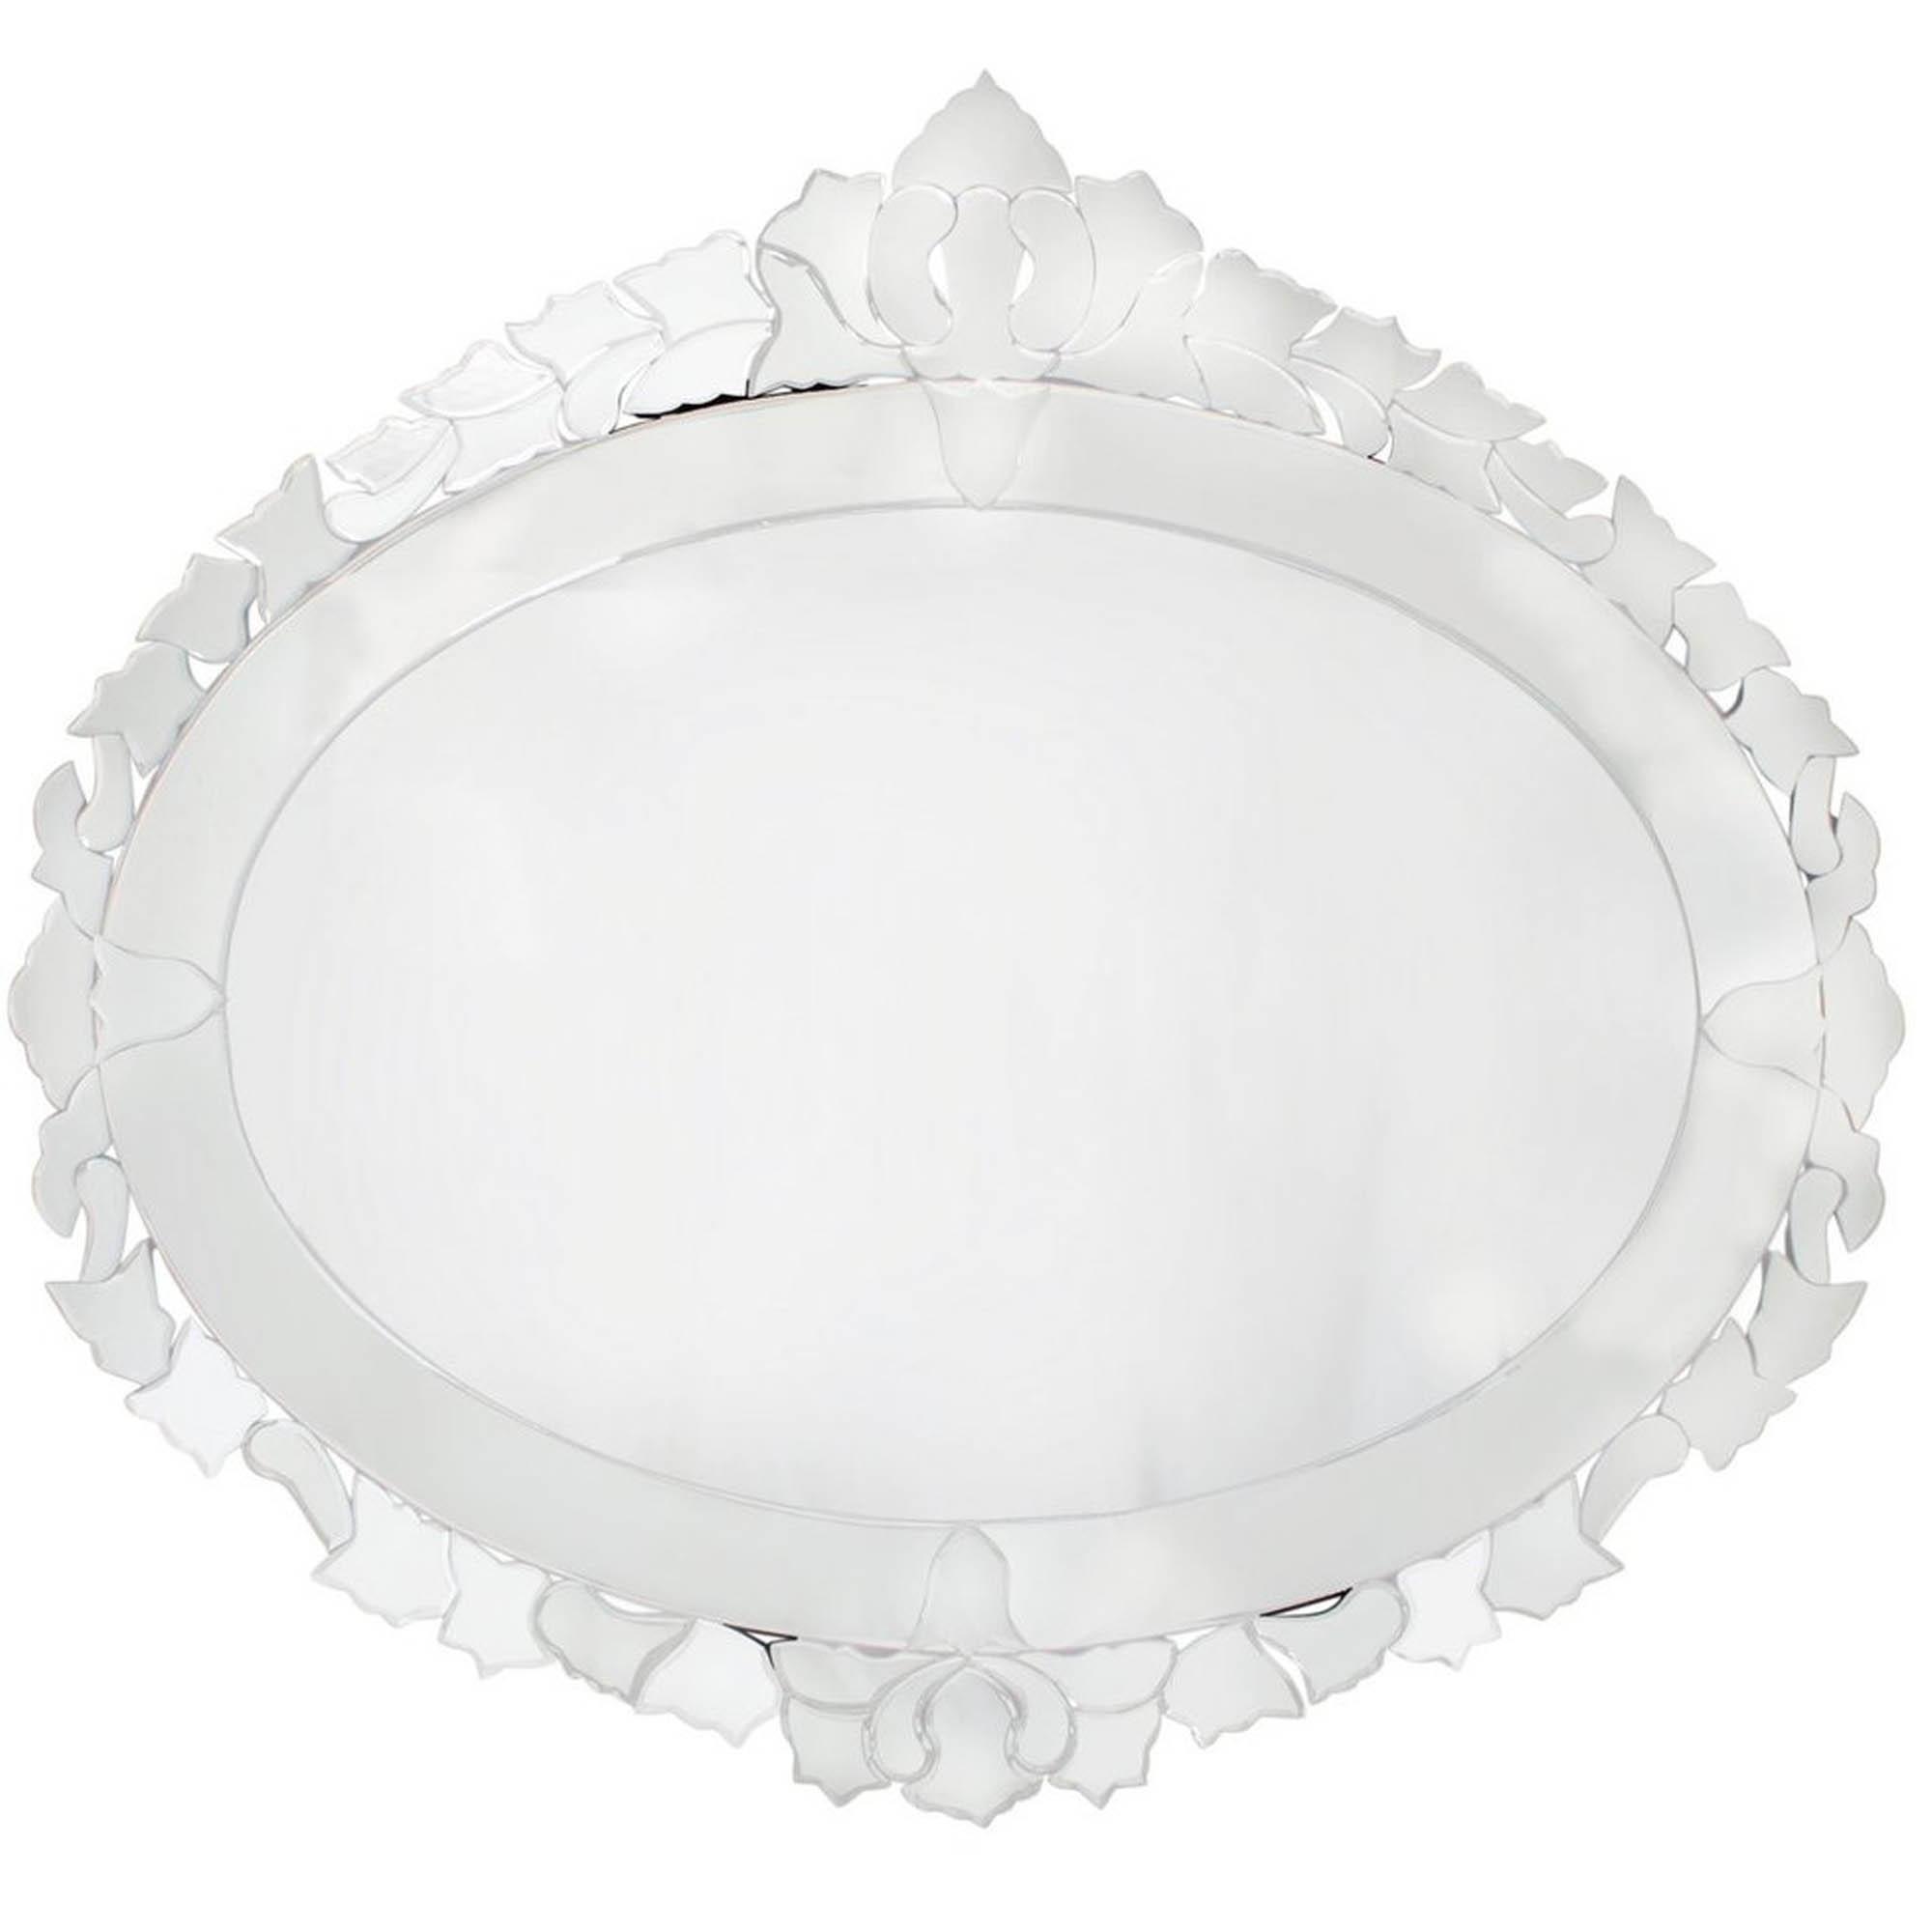 Venetian Oval Wall Mirror Decor Homesdirect365